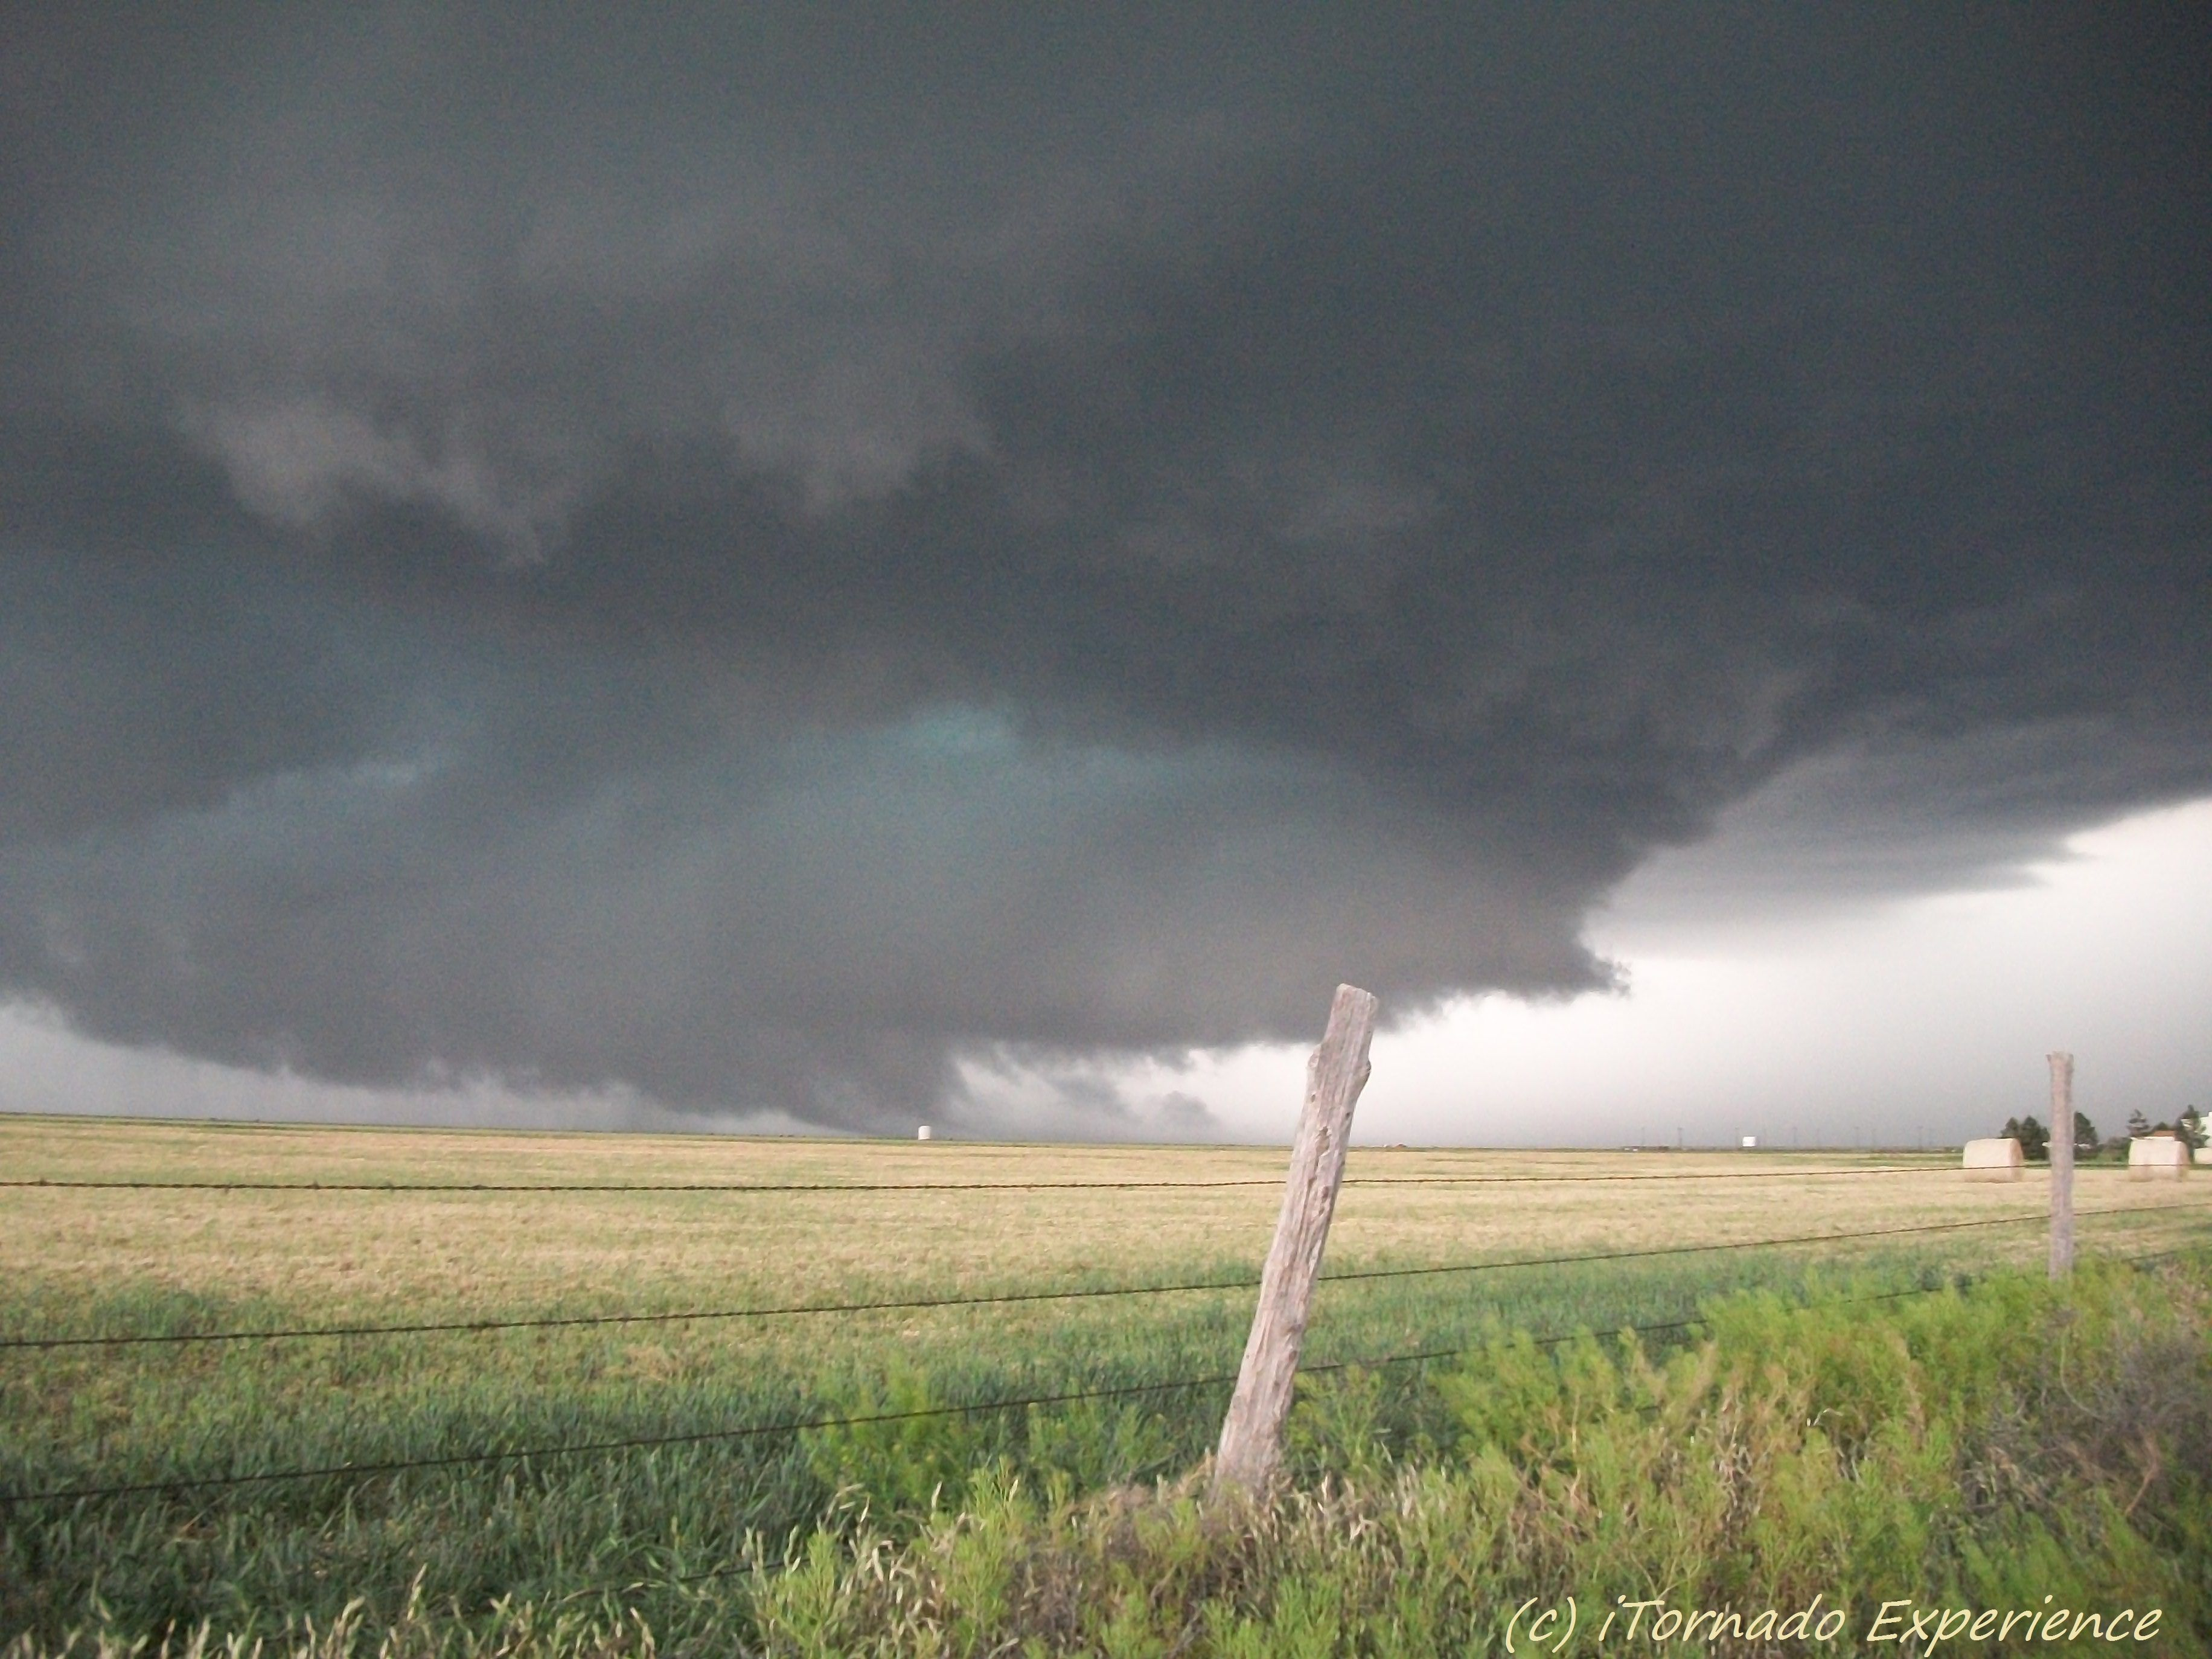 Tornado Warned Supercell Thunderstorm Near Stinnett Tx